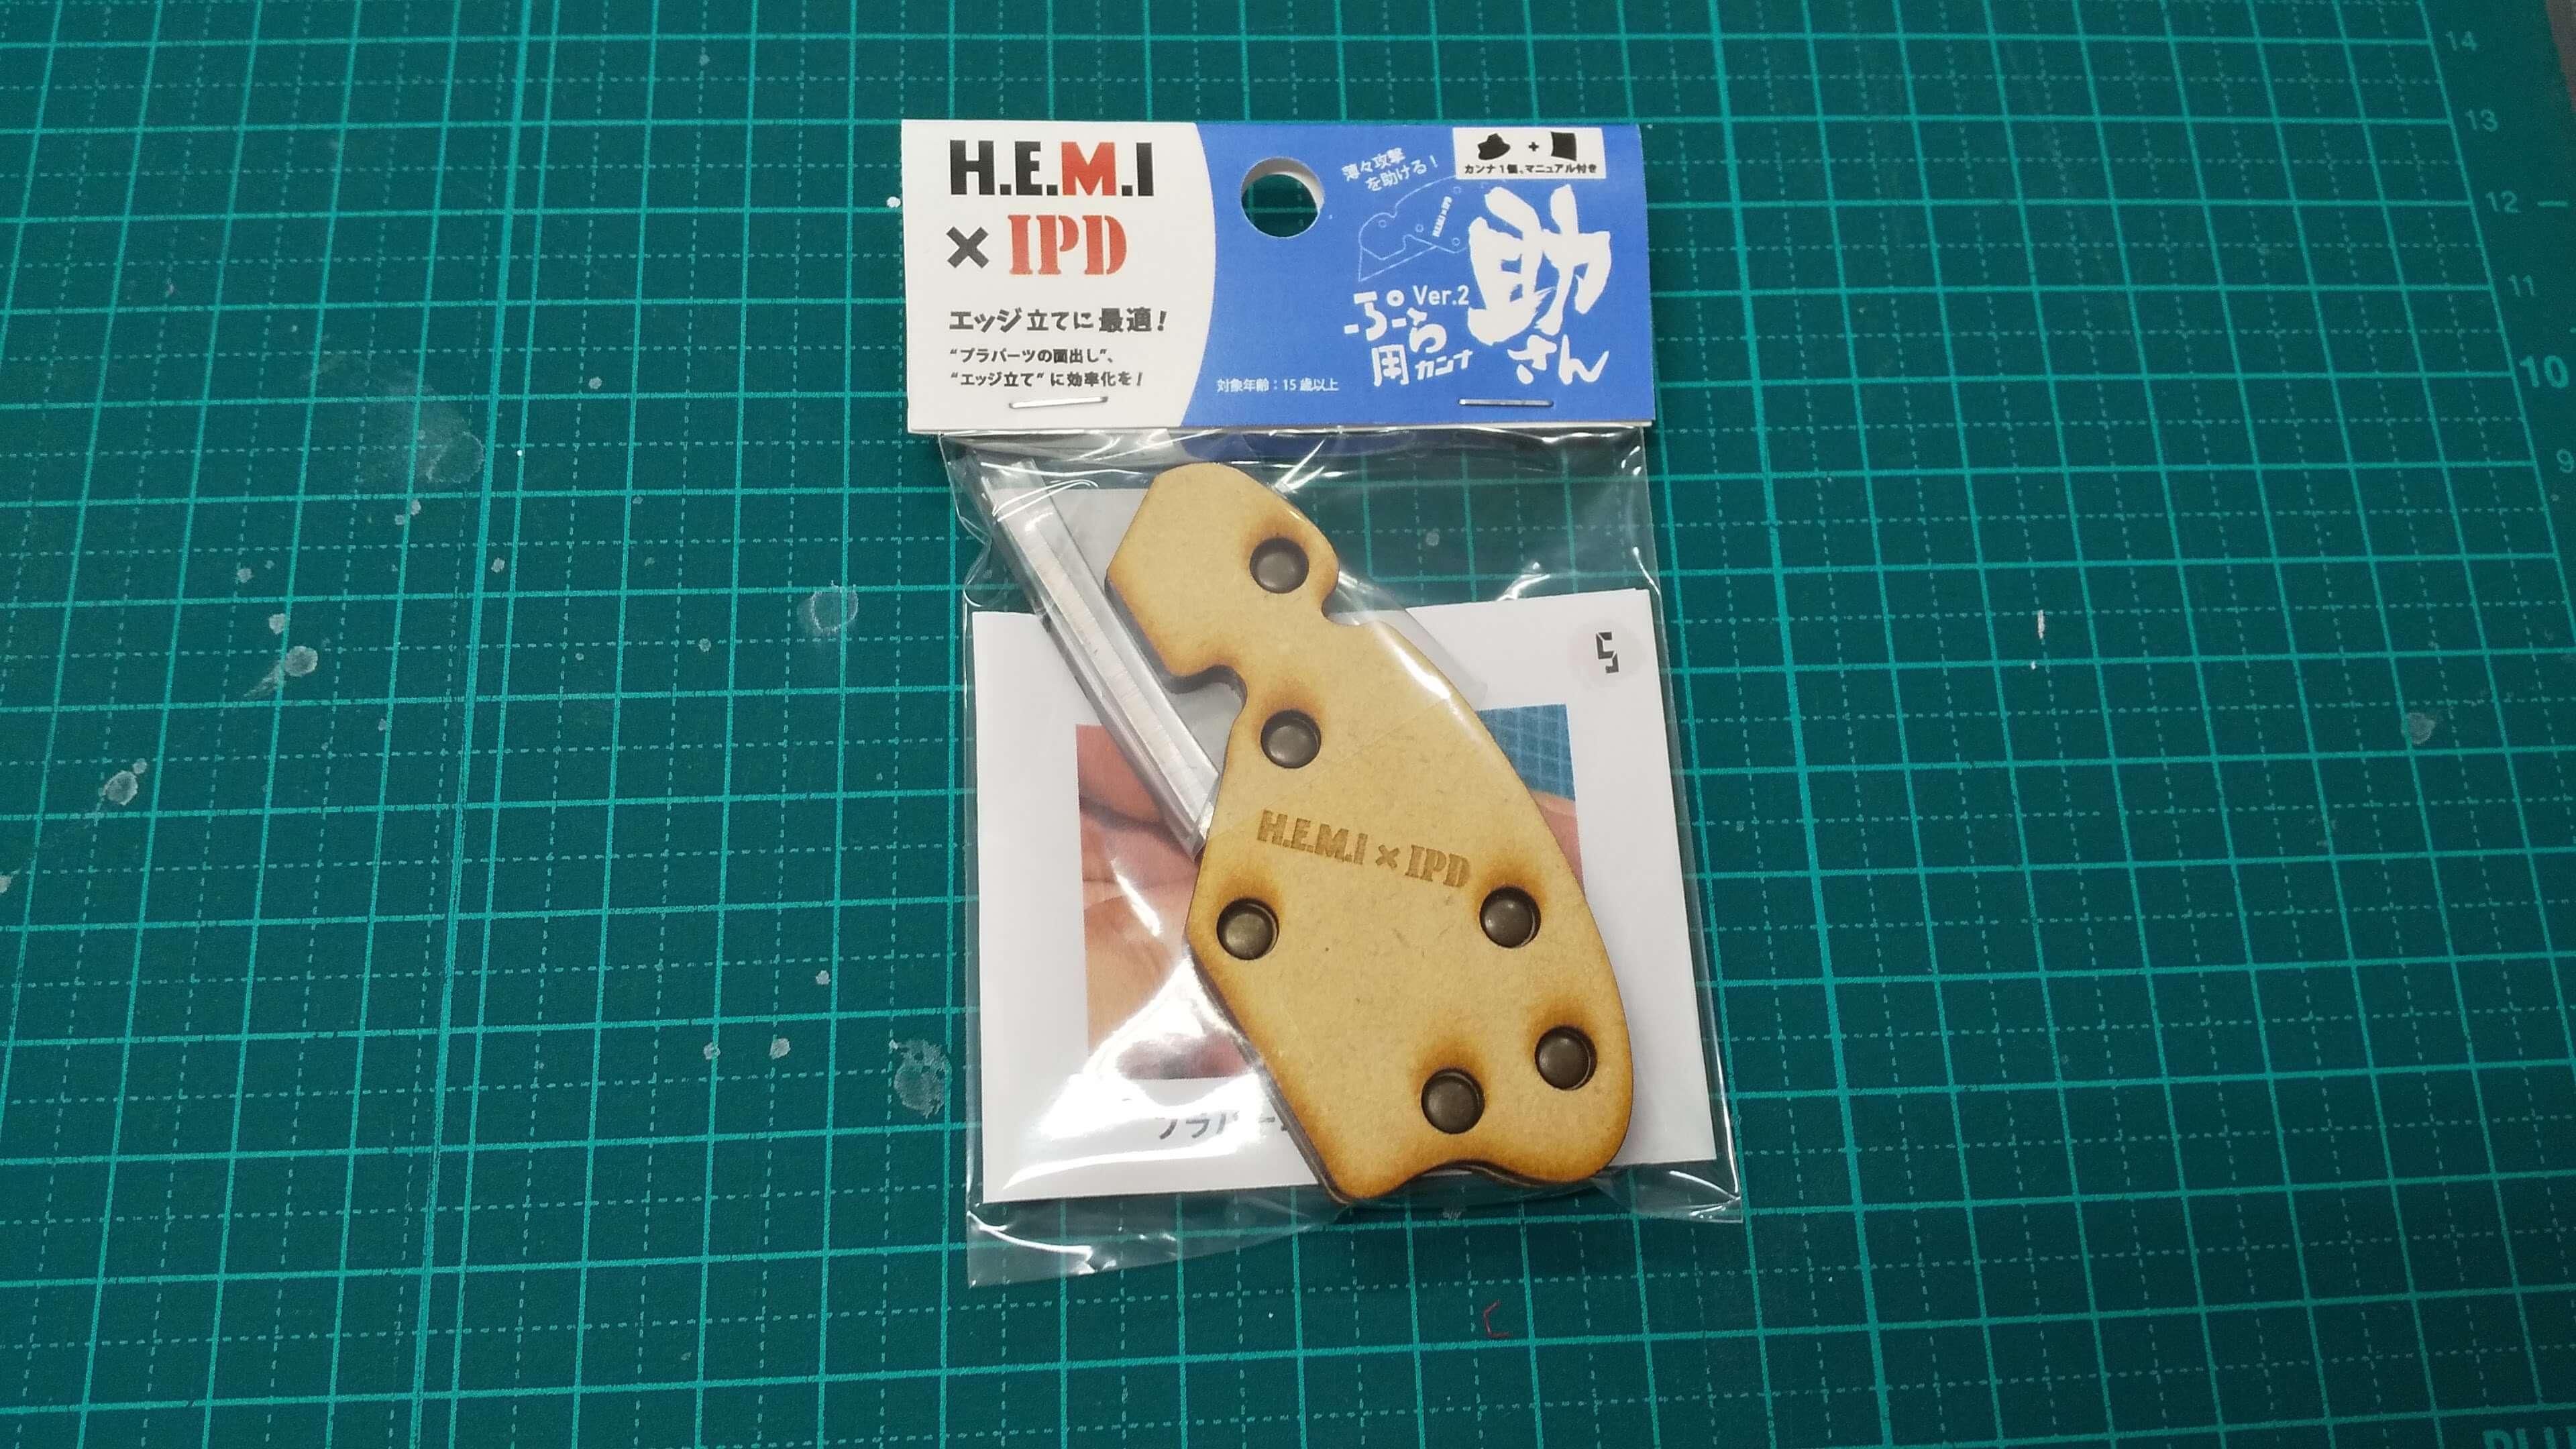 HEMIxIPD ぷら用カンナ・助さん 4570099260044